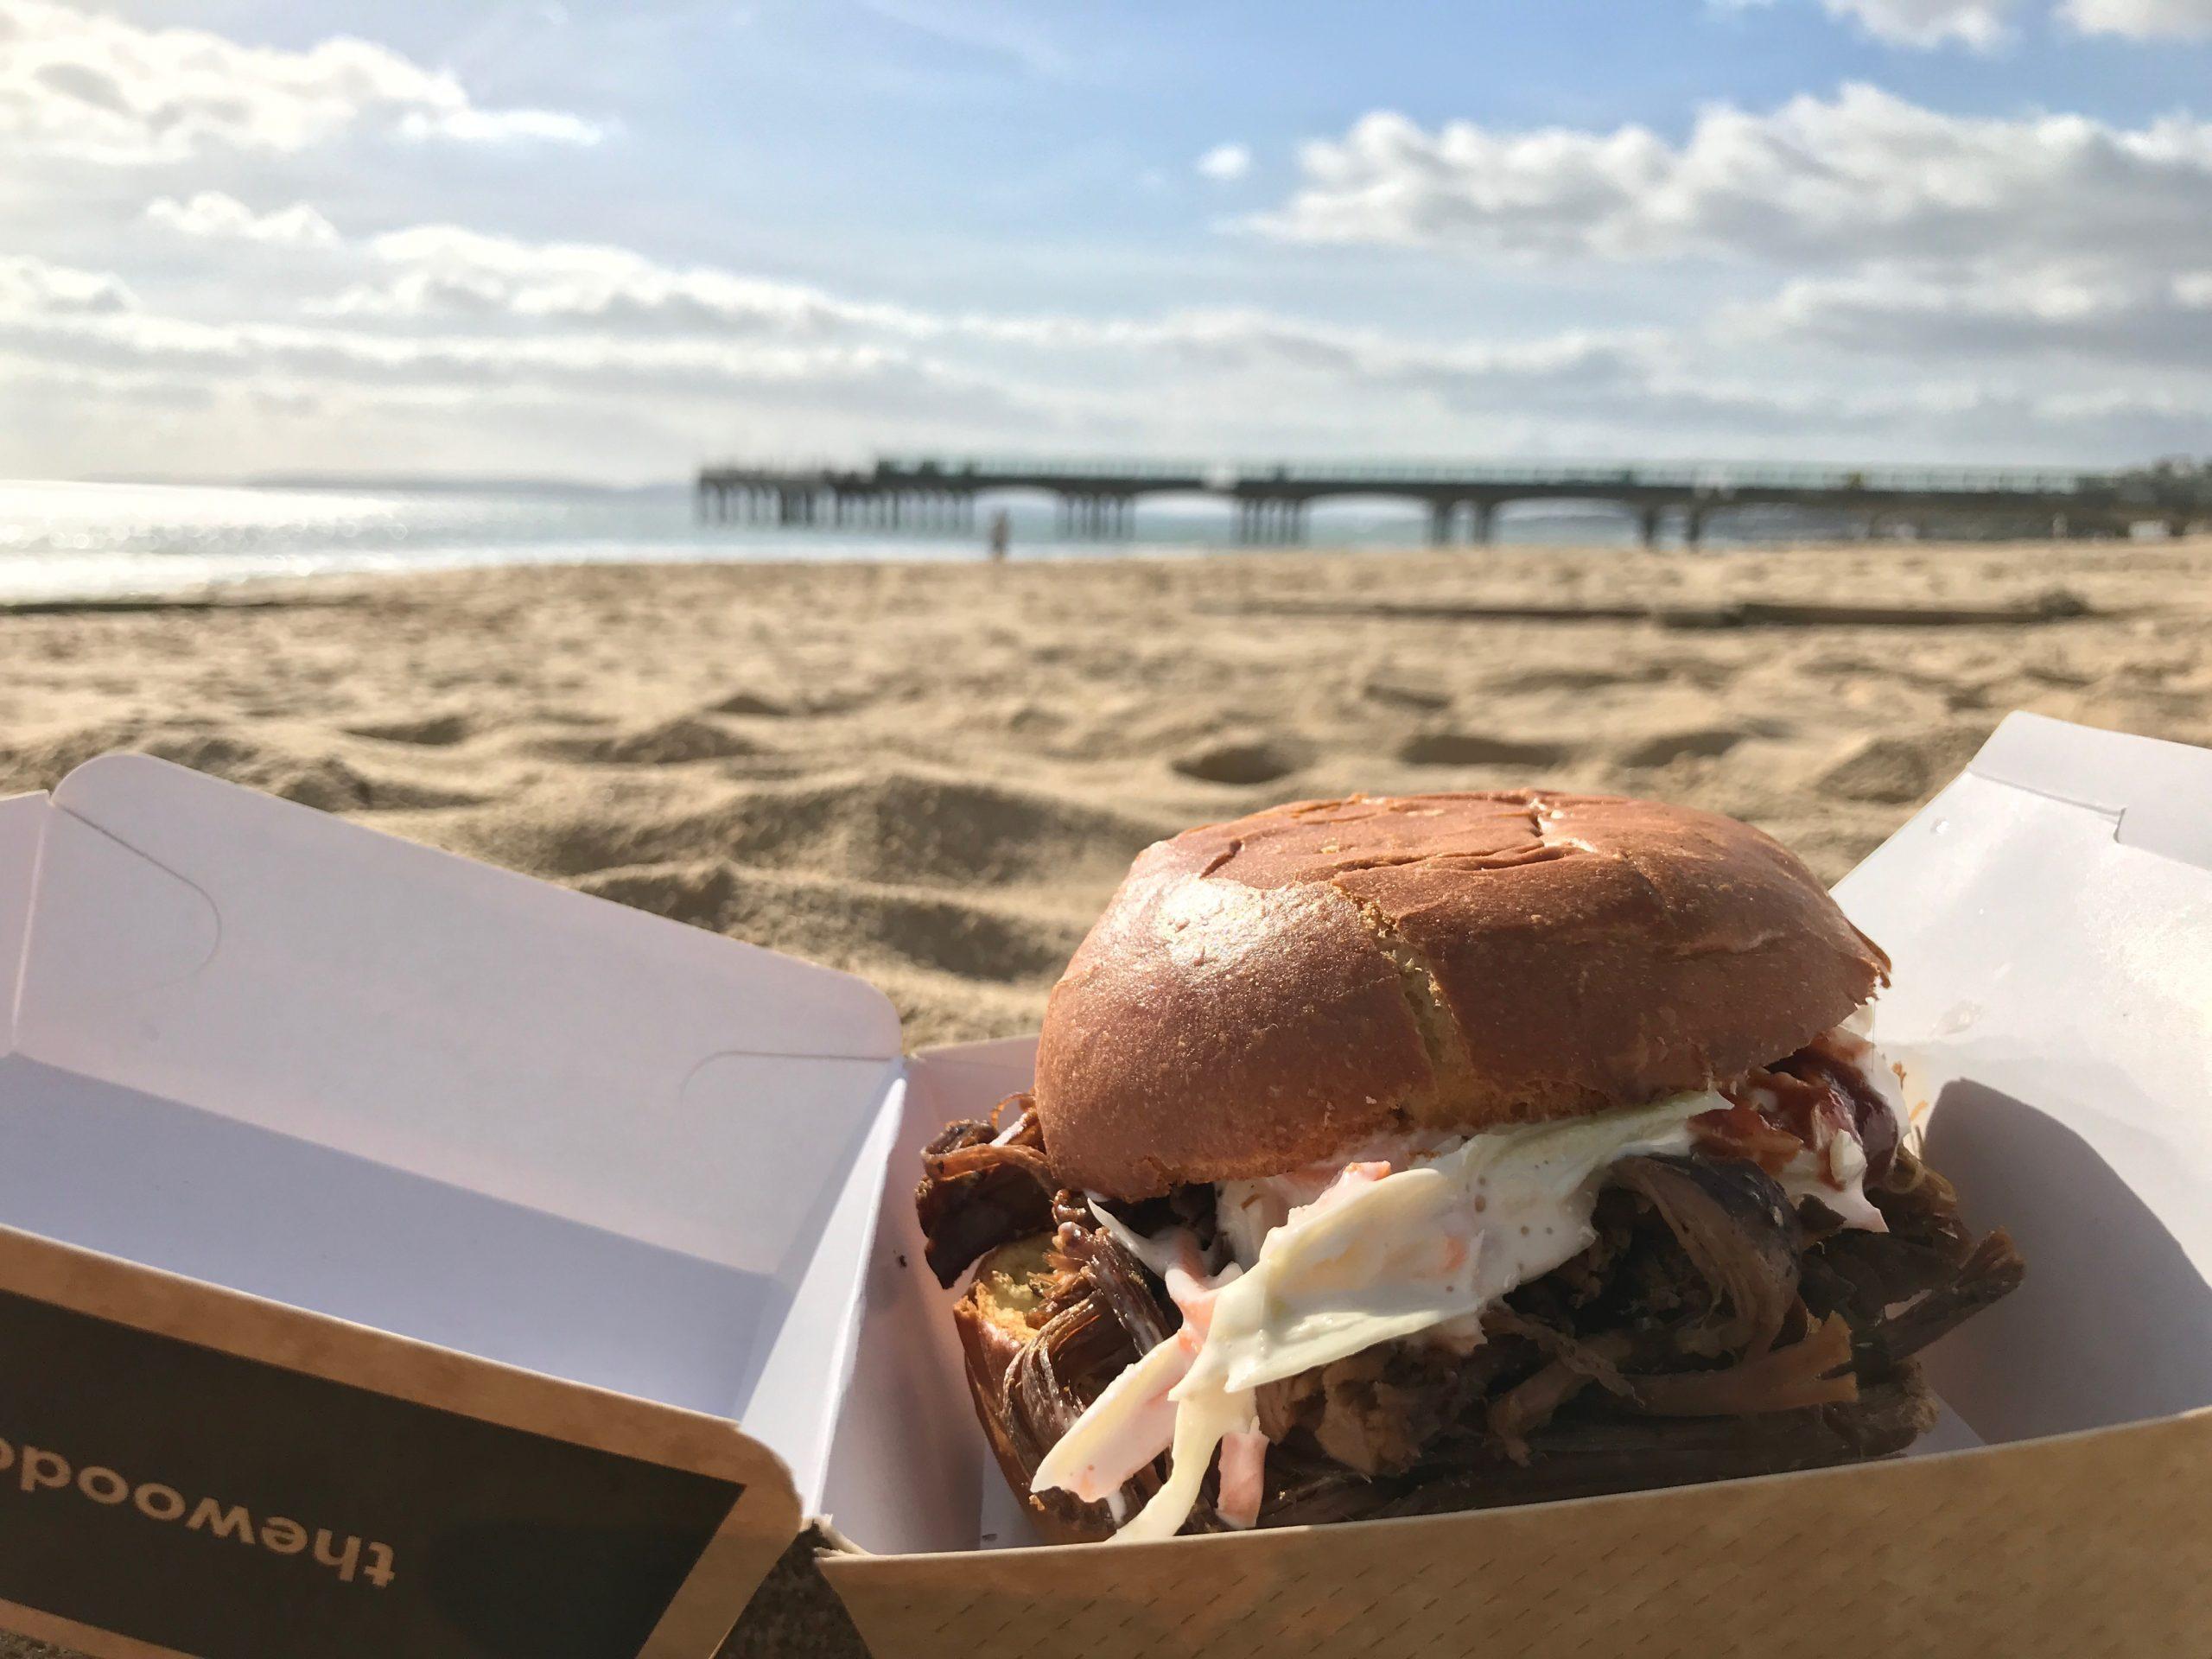 Boscombe beach food